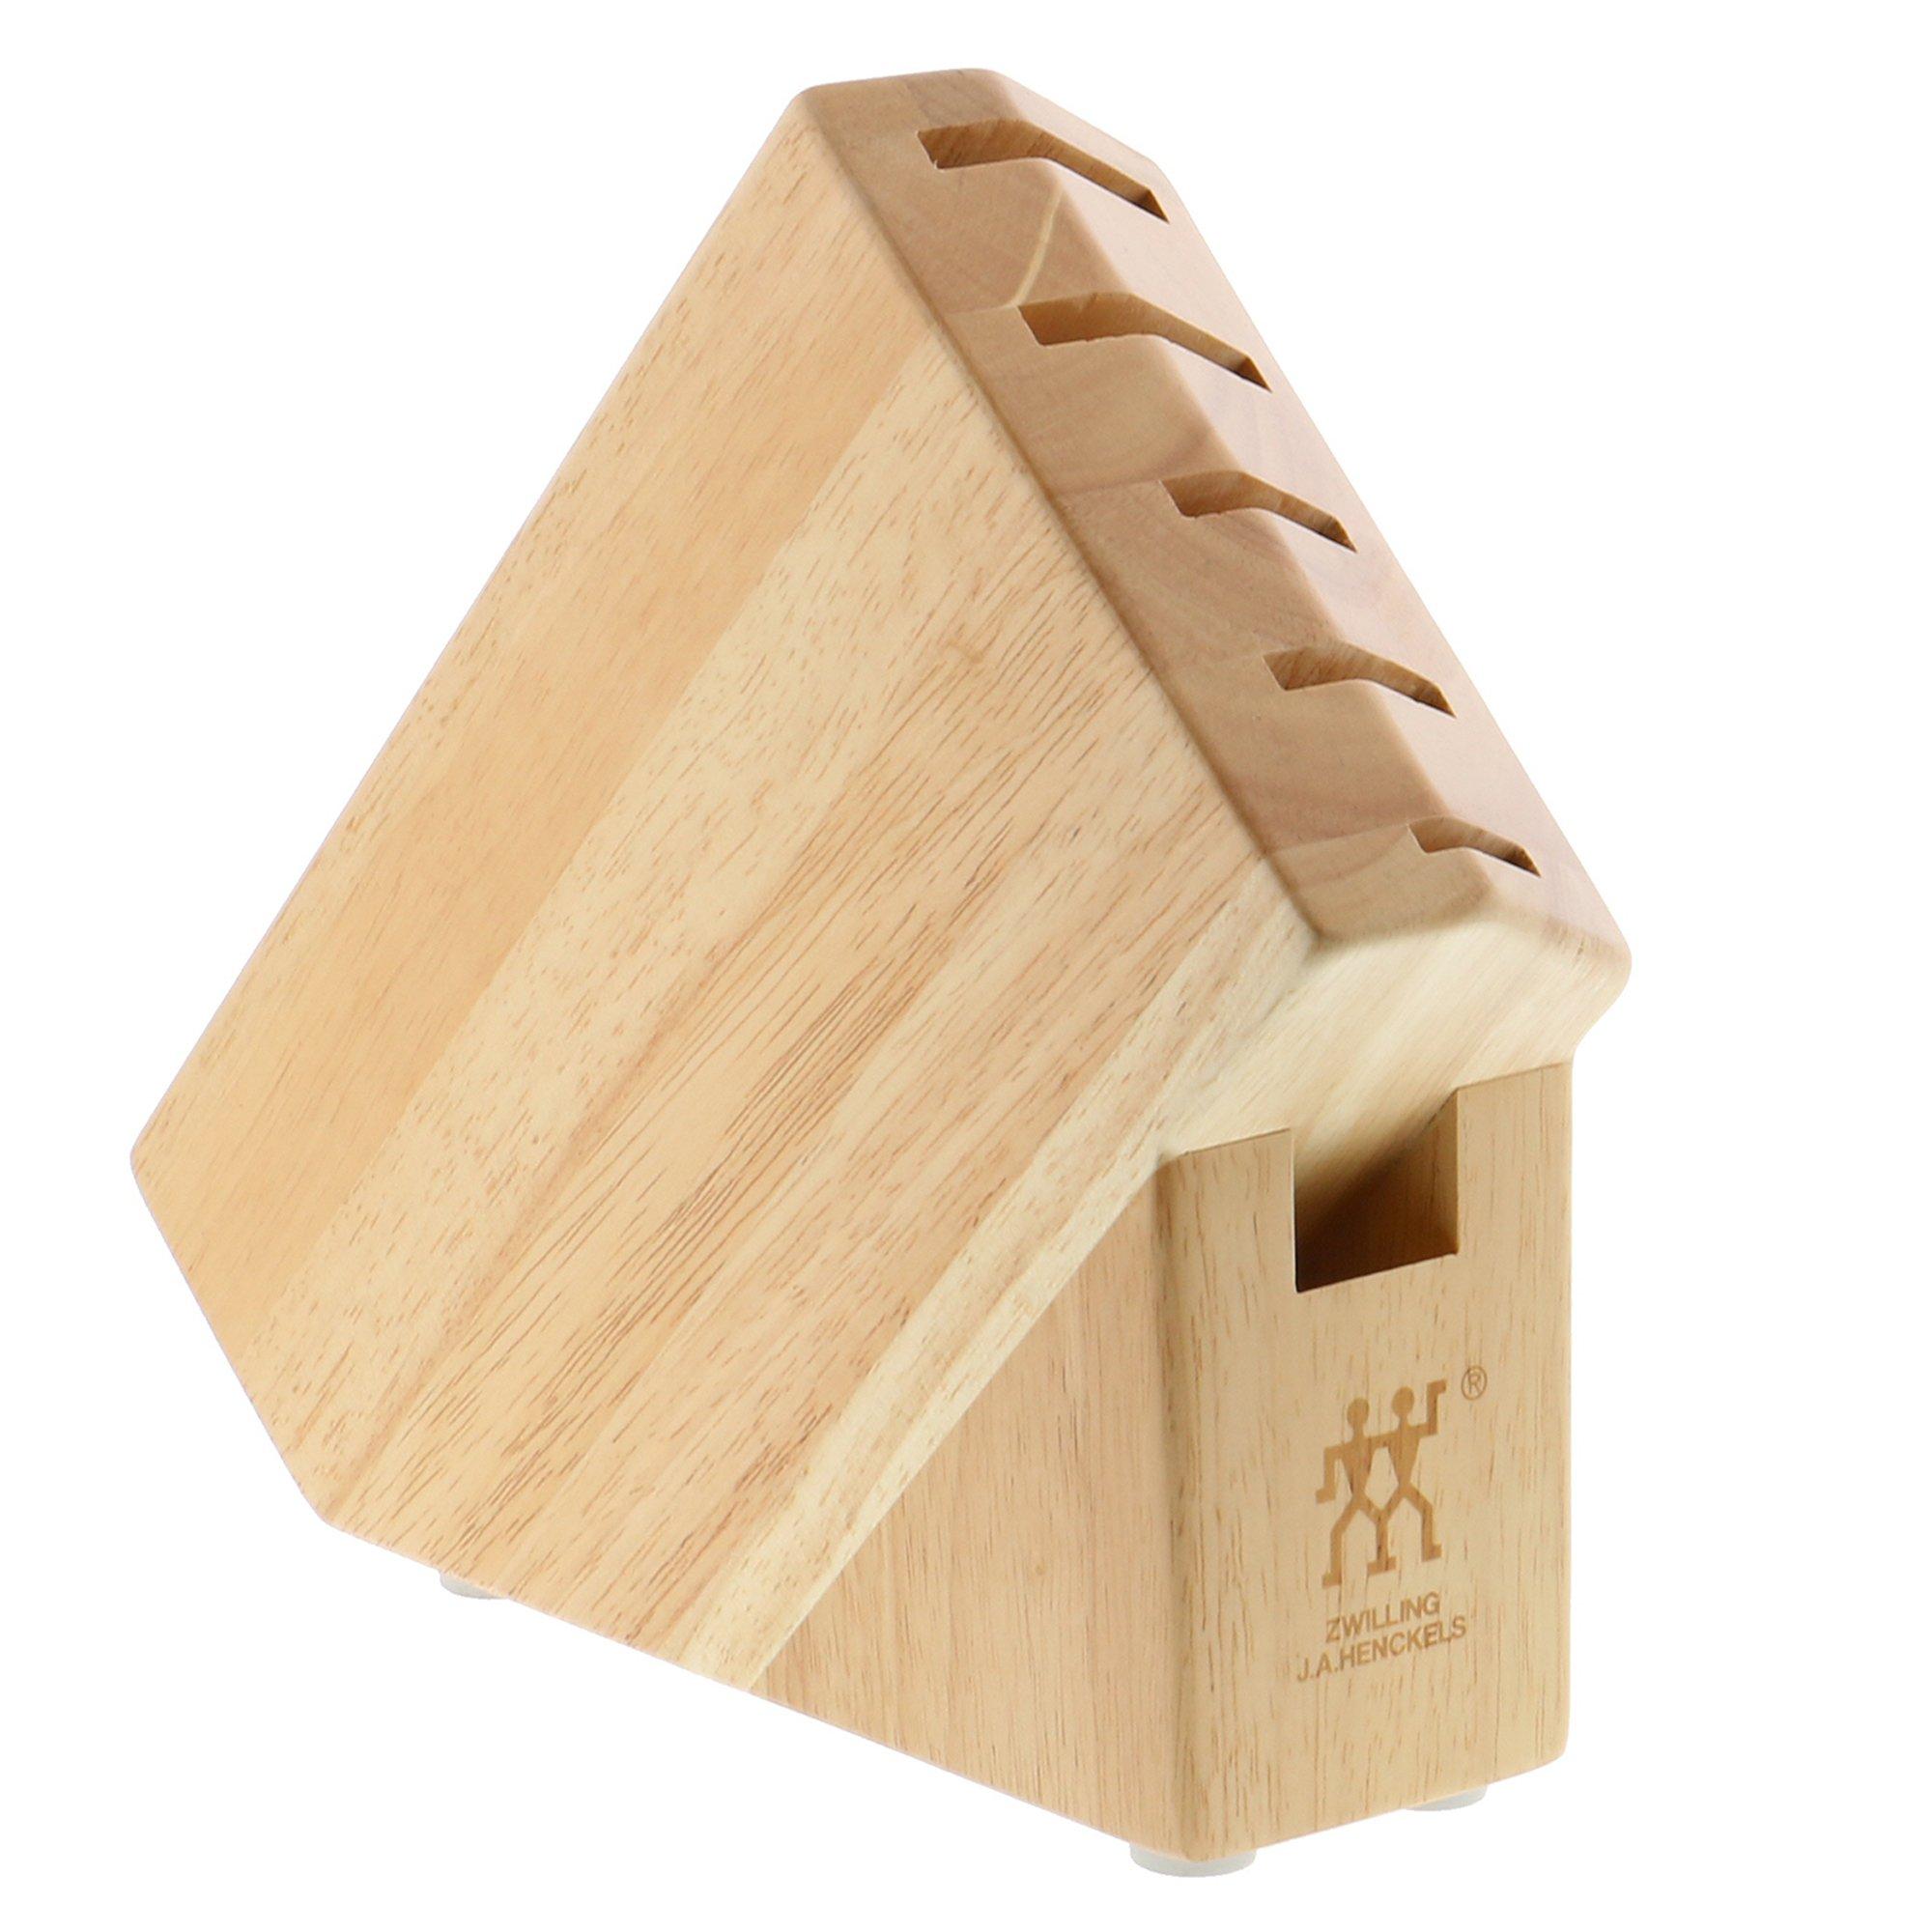 ZWILLING Pro Rubberwood Studio 6-slot Knife Block